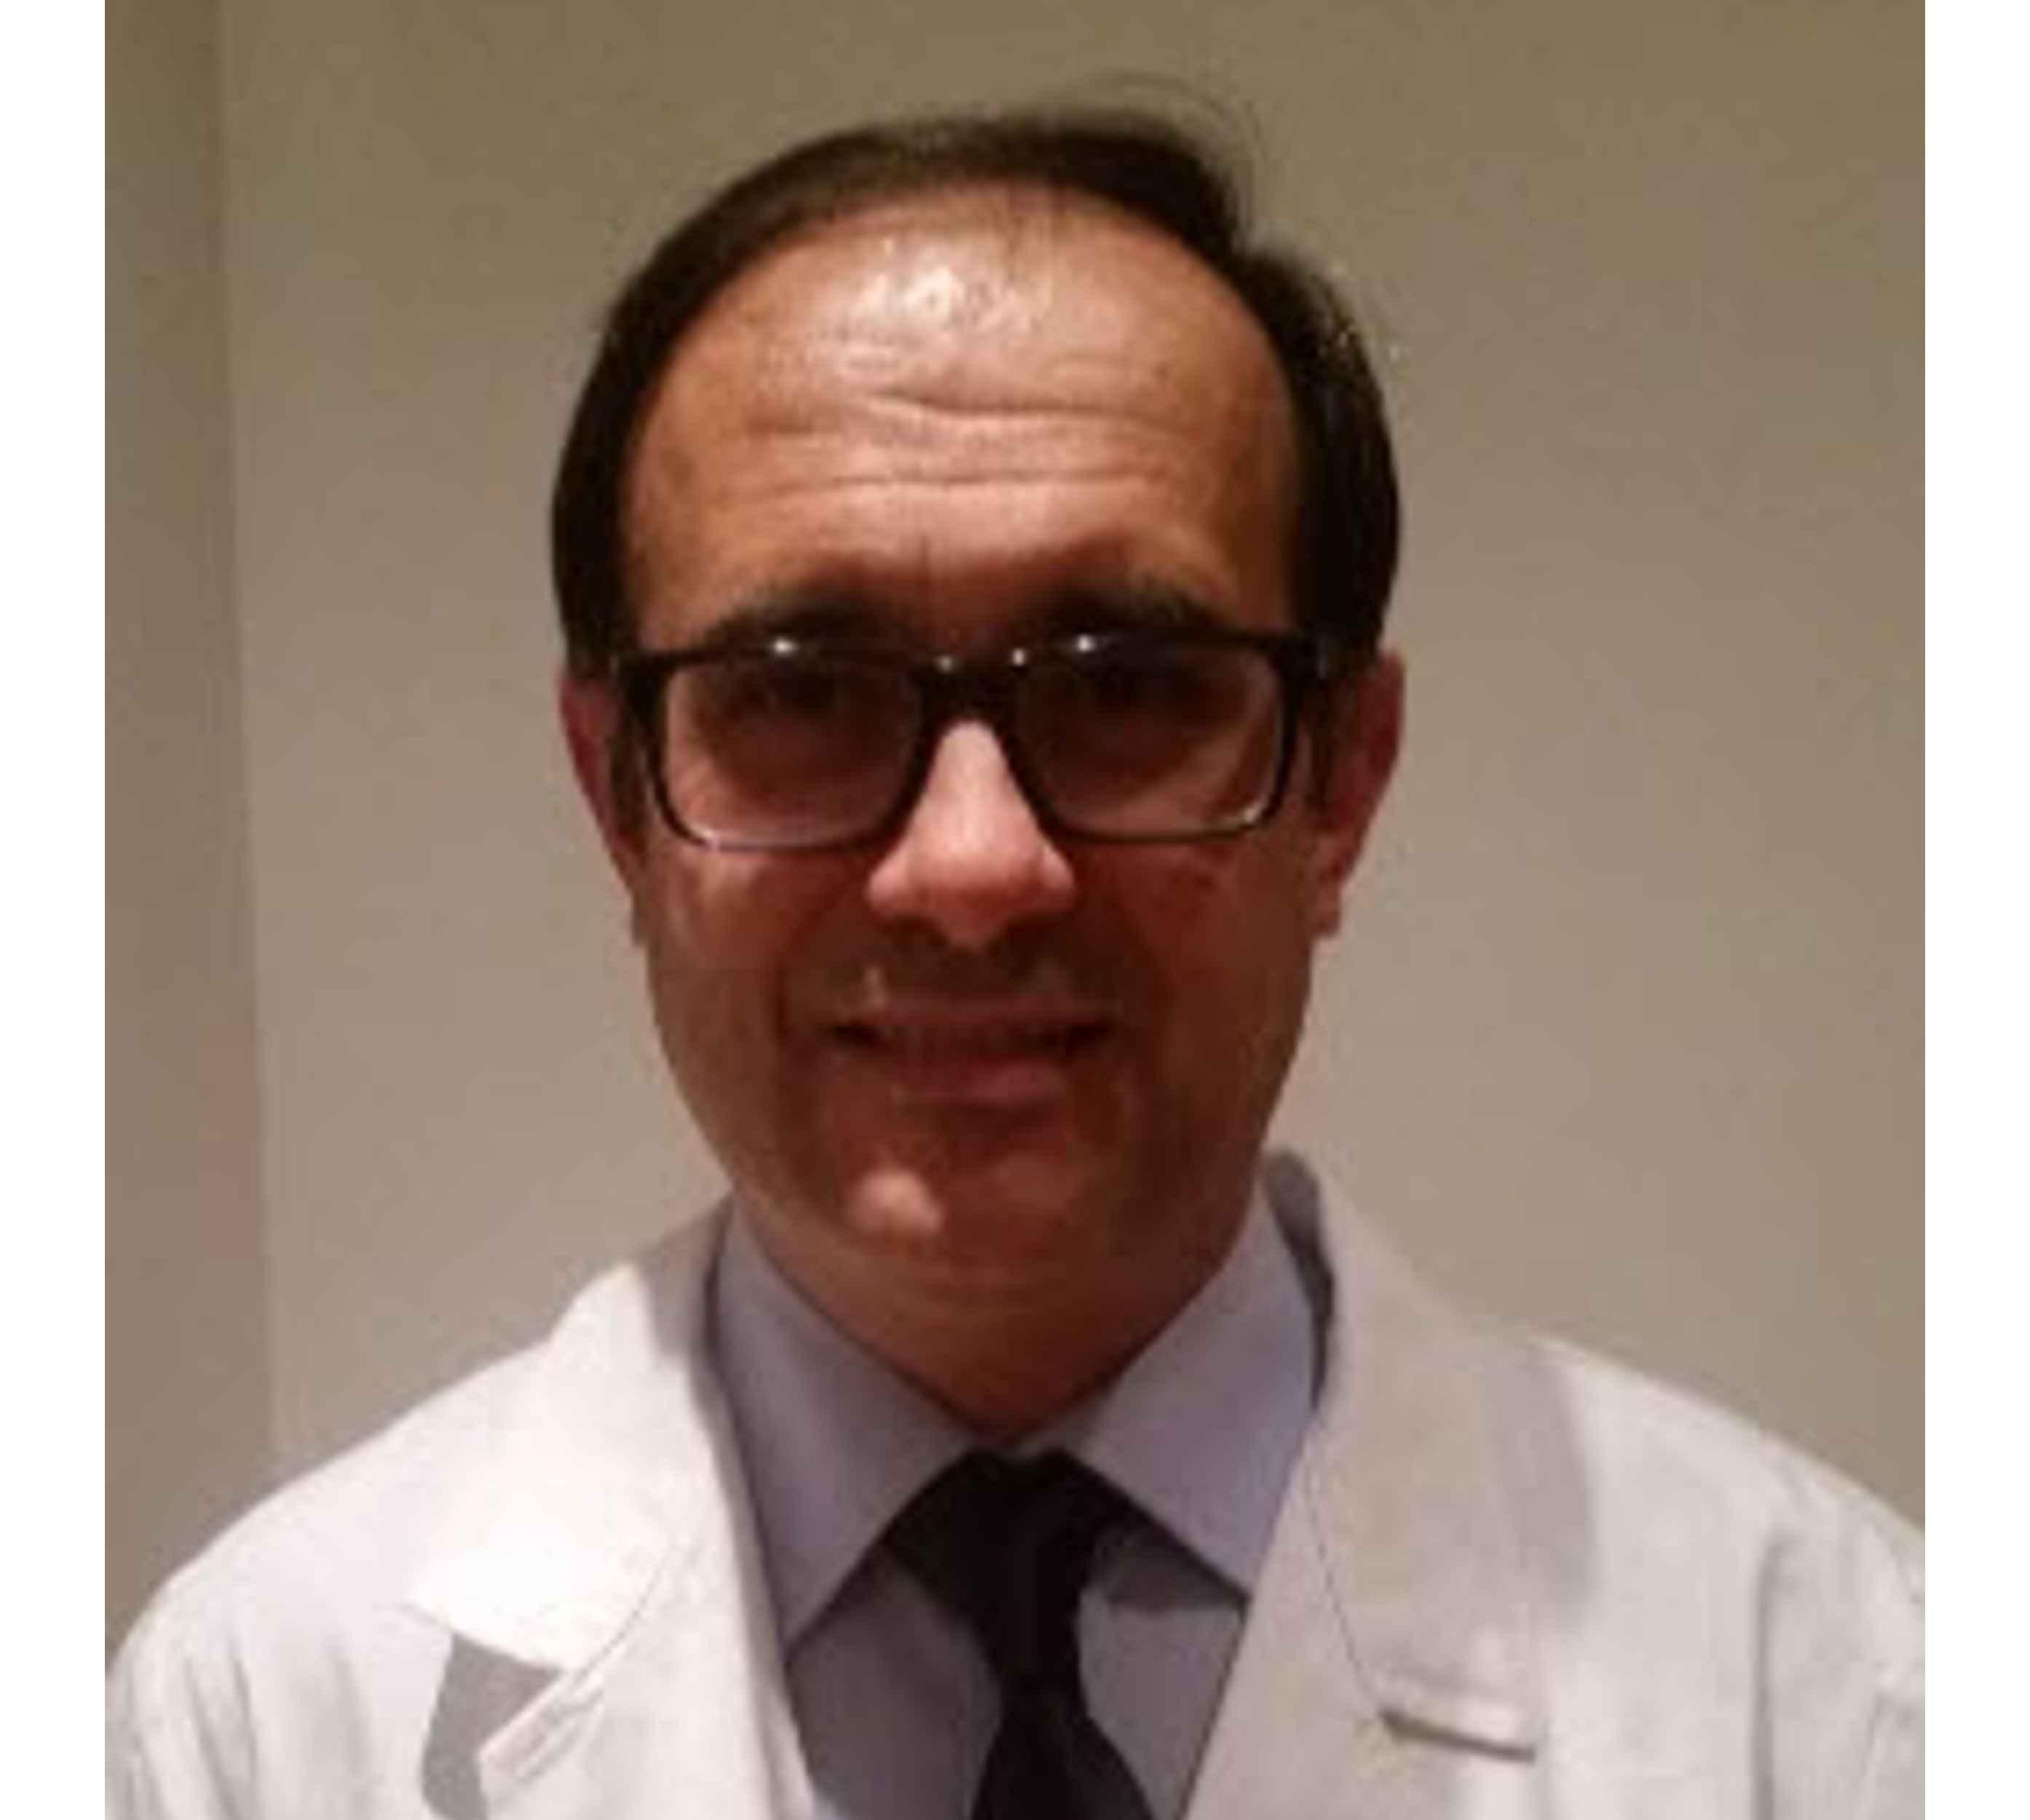 Dott. Federico Pellegrini